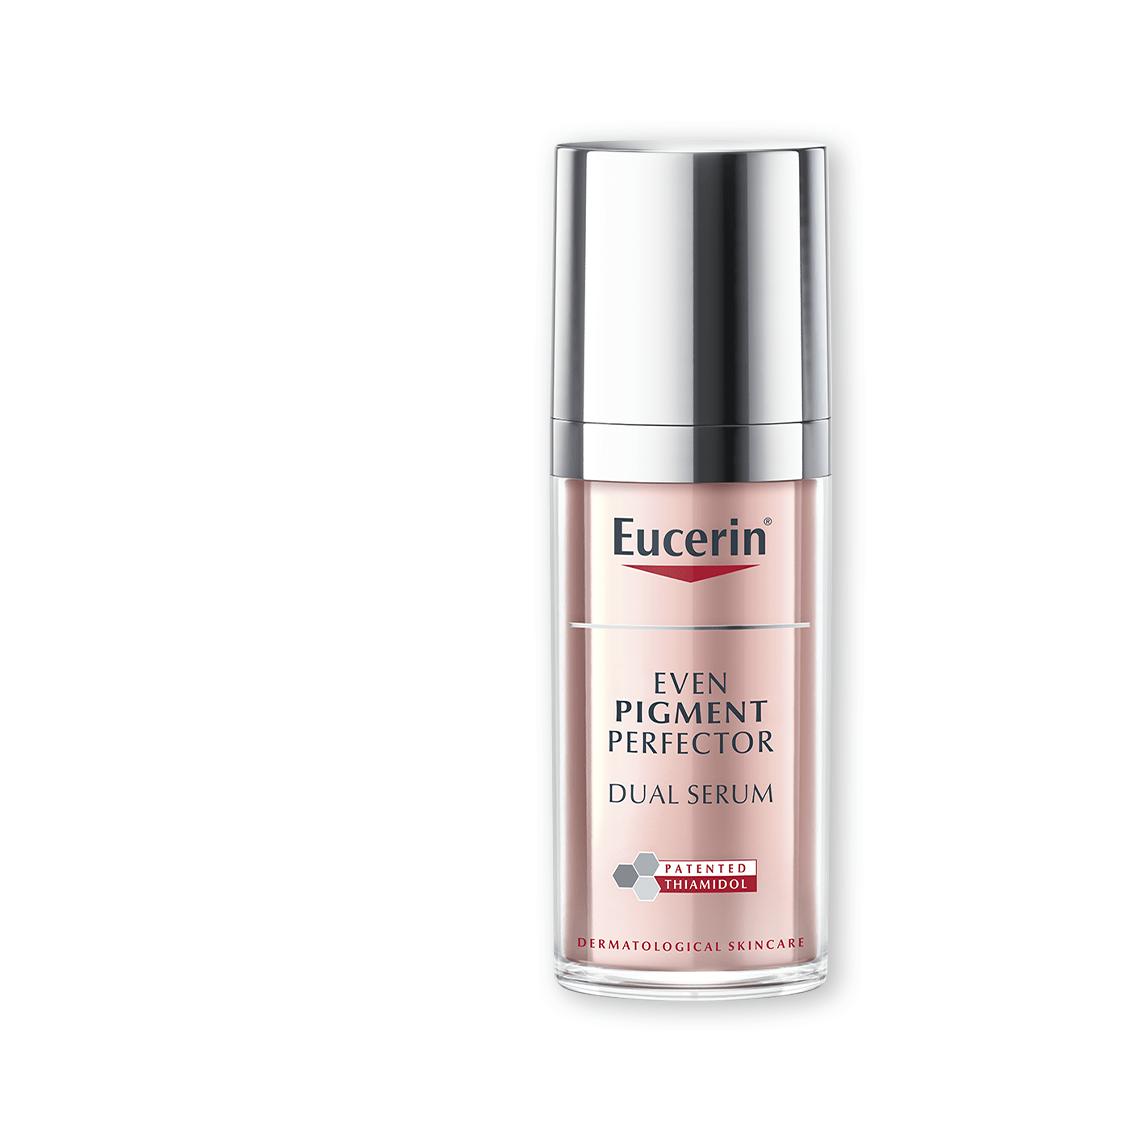 Eucerin Even Pigment Perfector Dual Serum